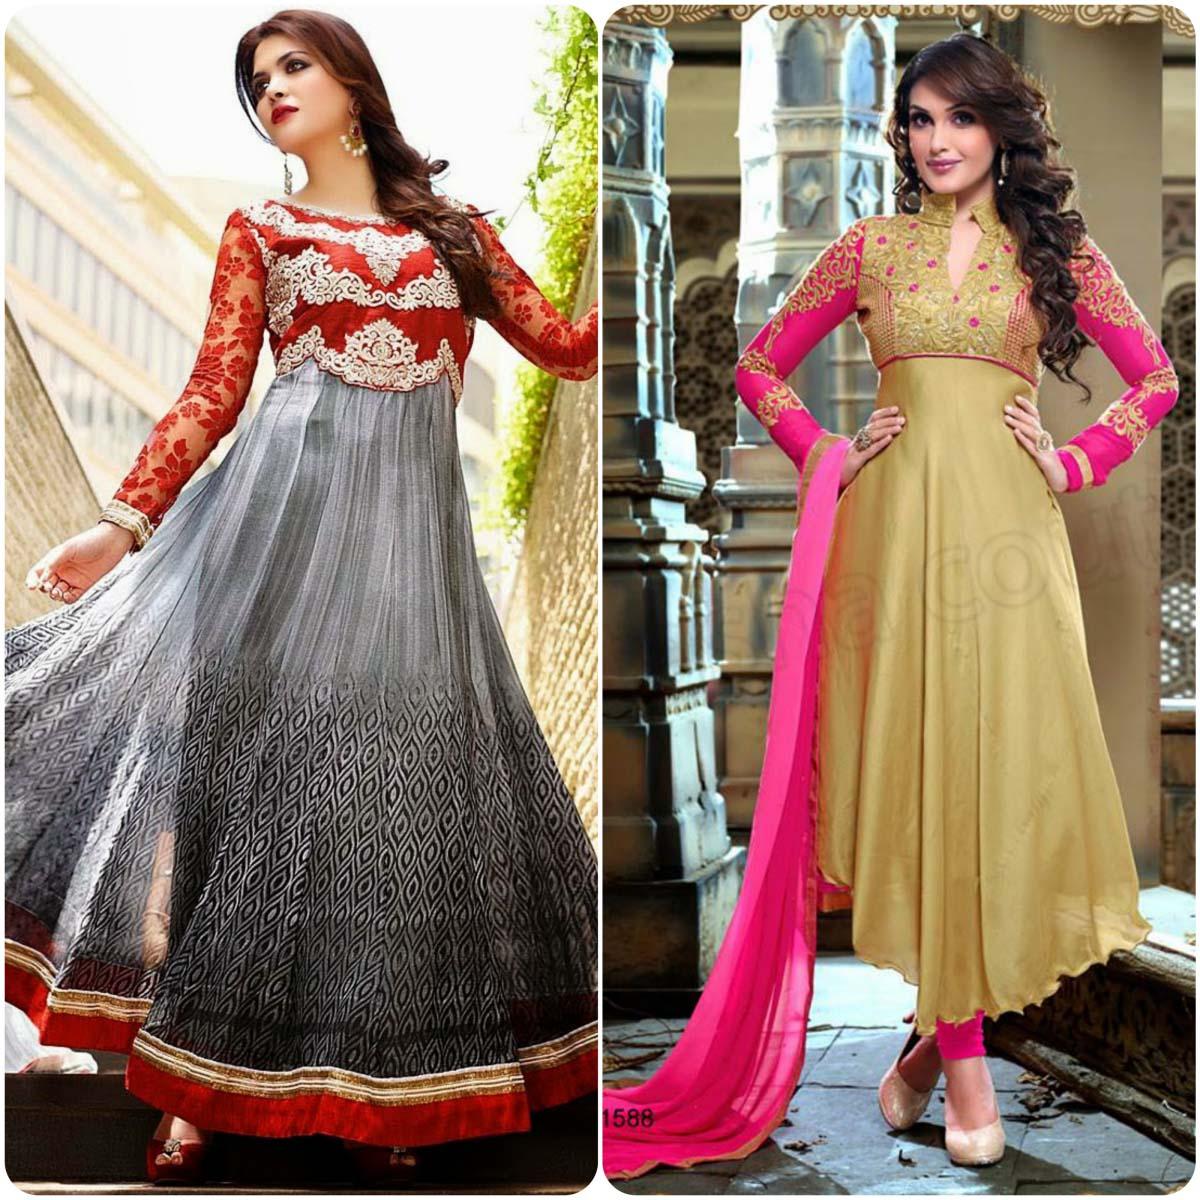 Natasha Couture Latest Indian Anarkali Dress Desigs Collection 2016-2017...styloplanet (3)